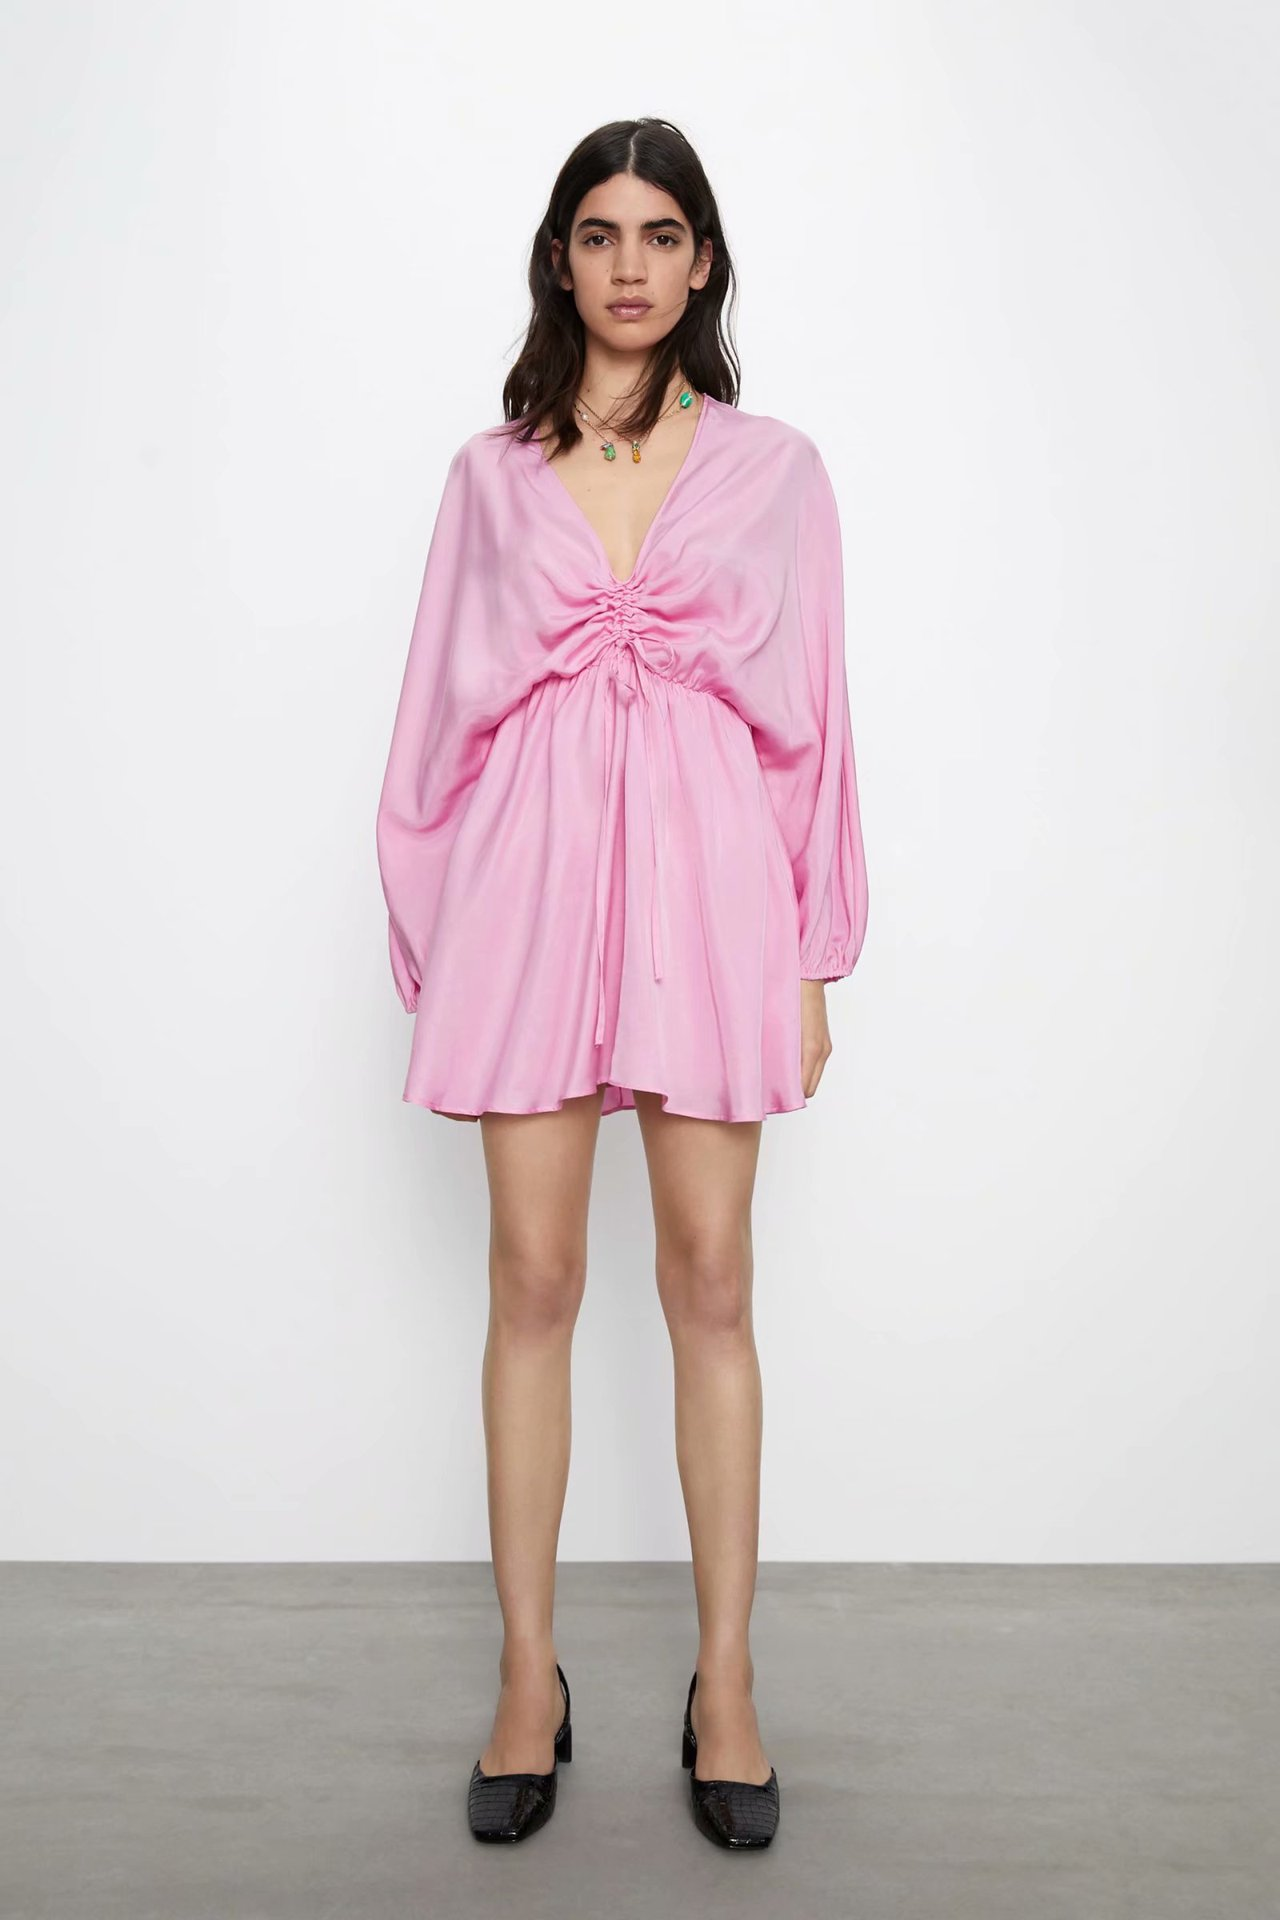 2020 Spring Summer New Style European Silk Textured Pleated Female Dress Zaraing Vadiming Sheining Women Dress HJH2798